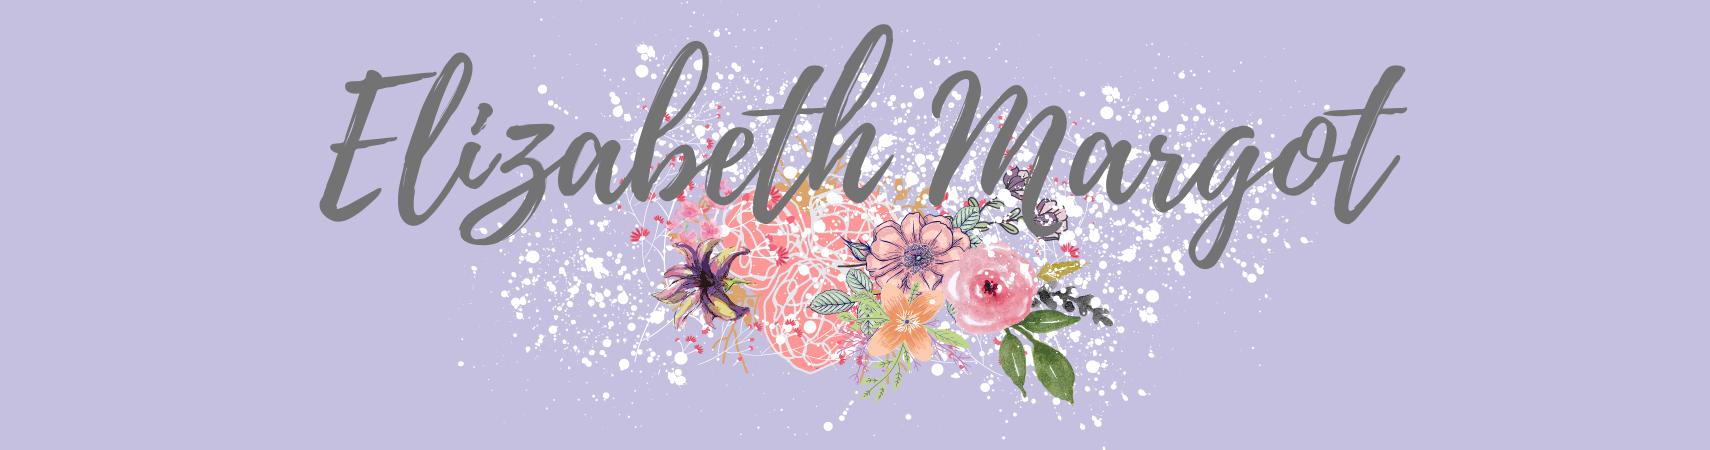 logo elizabeth margot fundo lilás